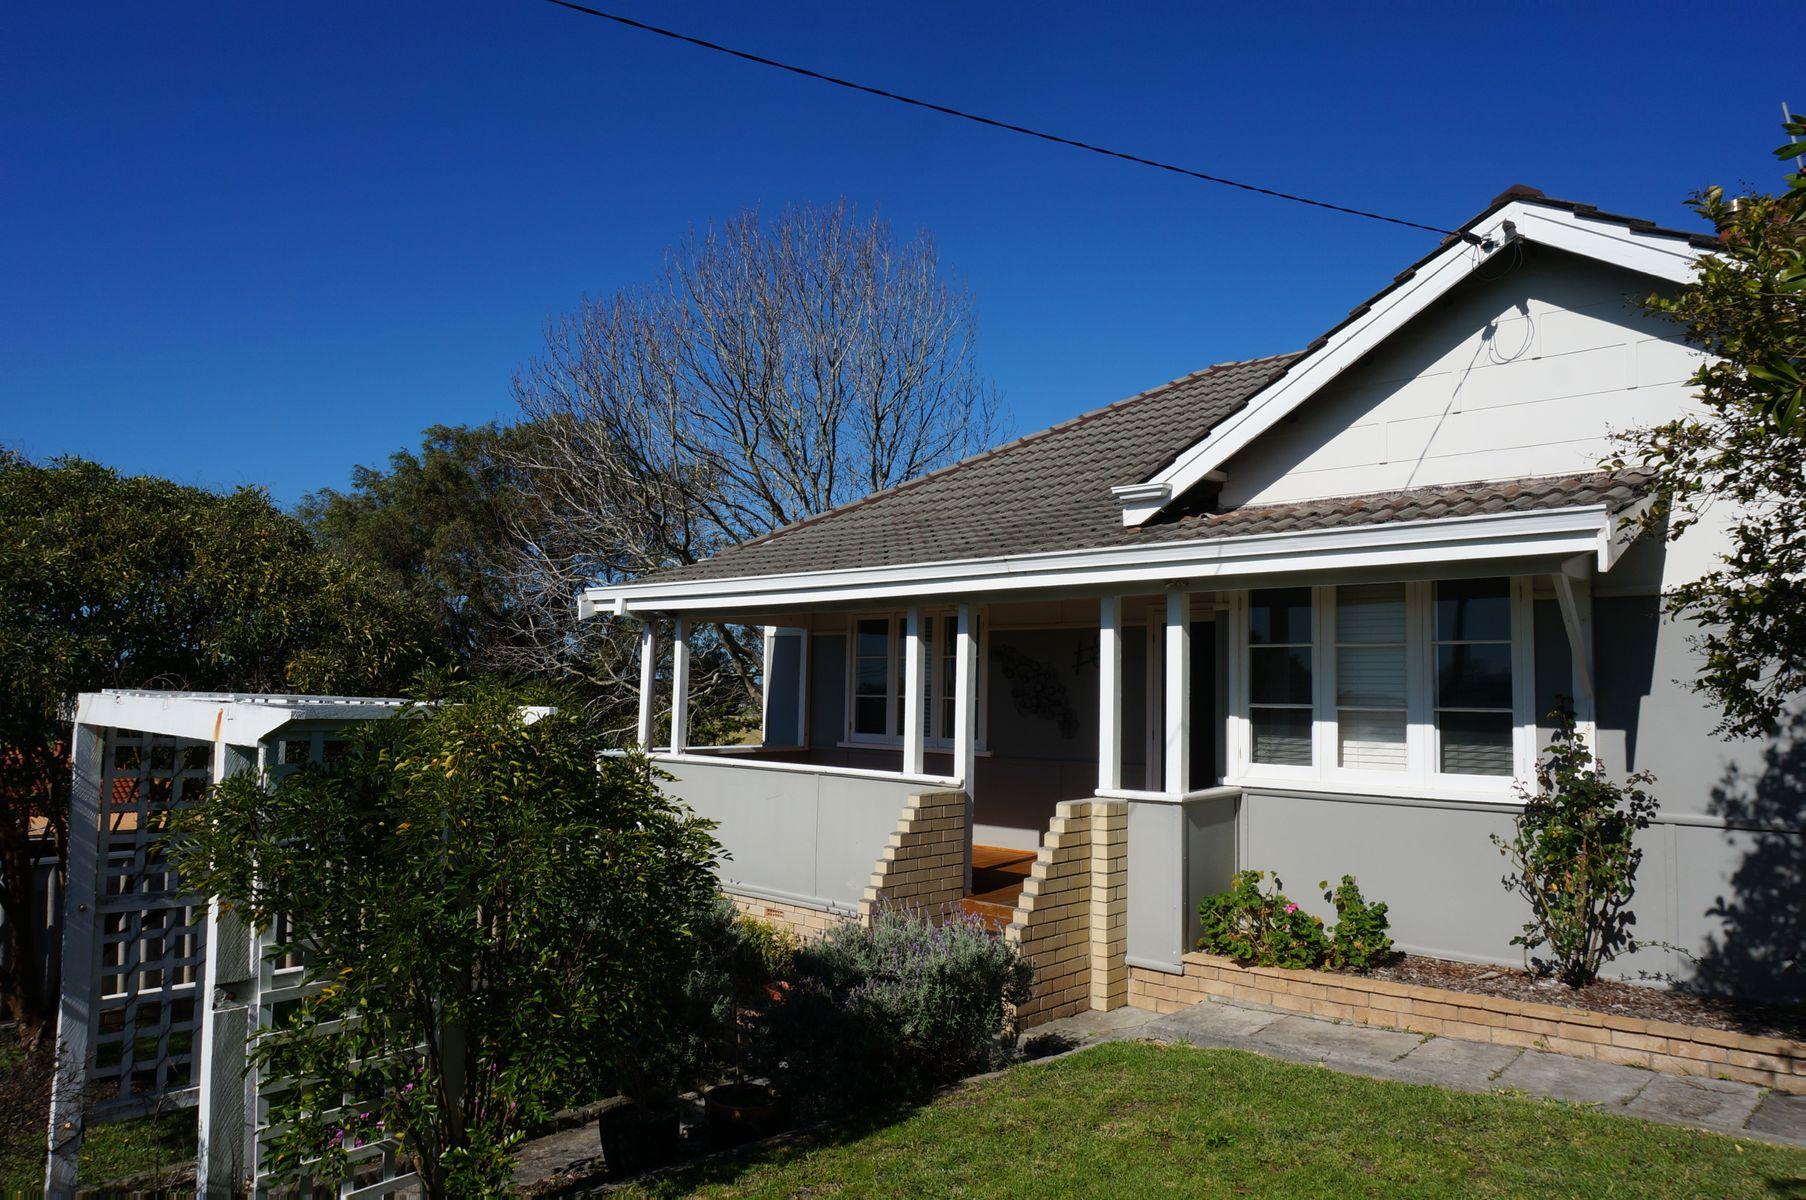 18 Angus Street, Mount Melville, WA 6330